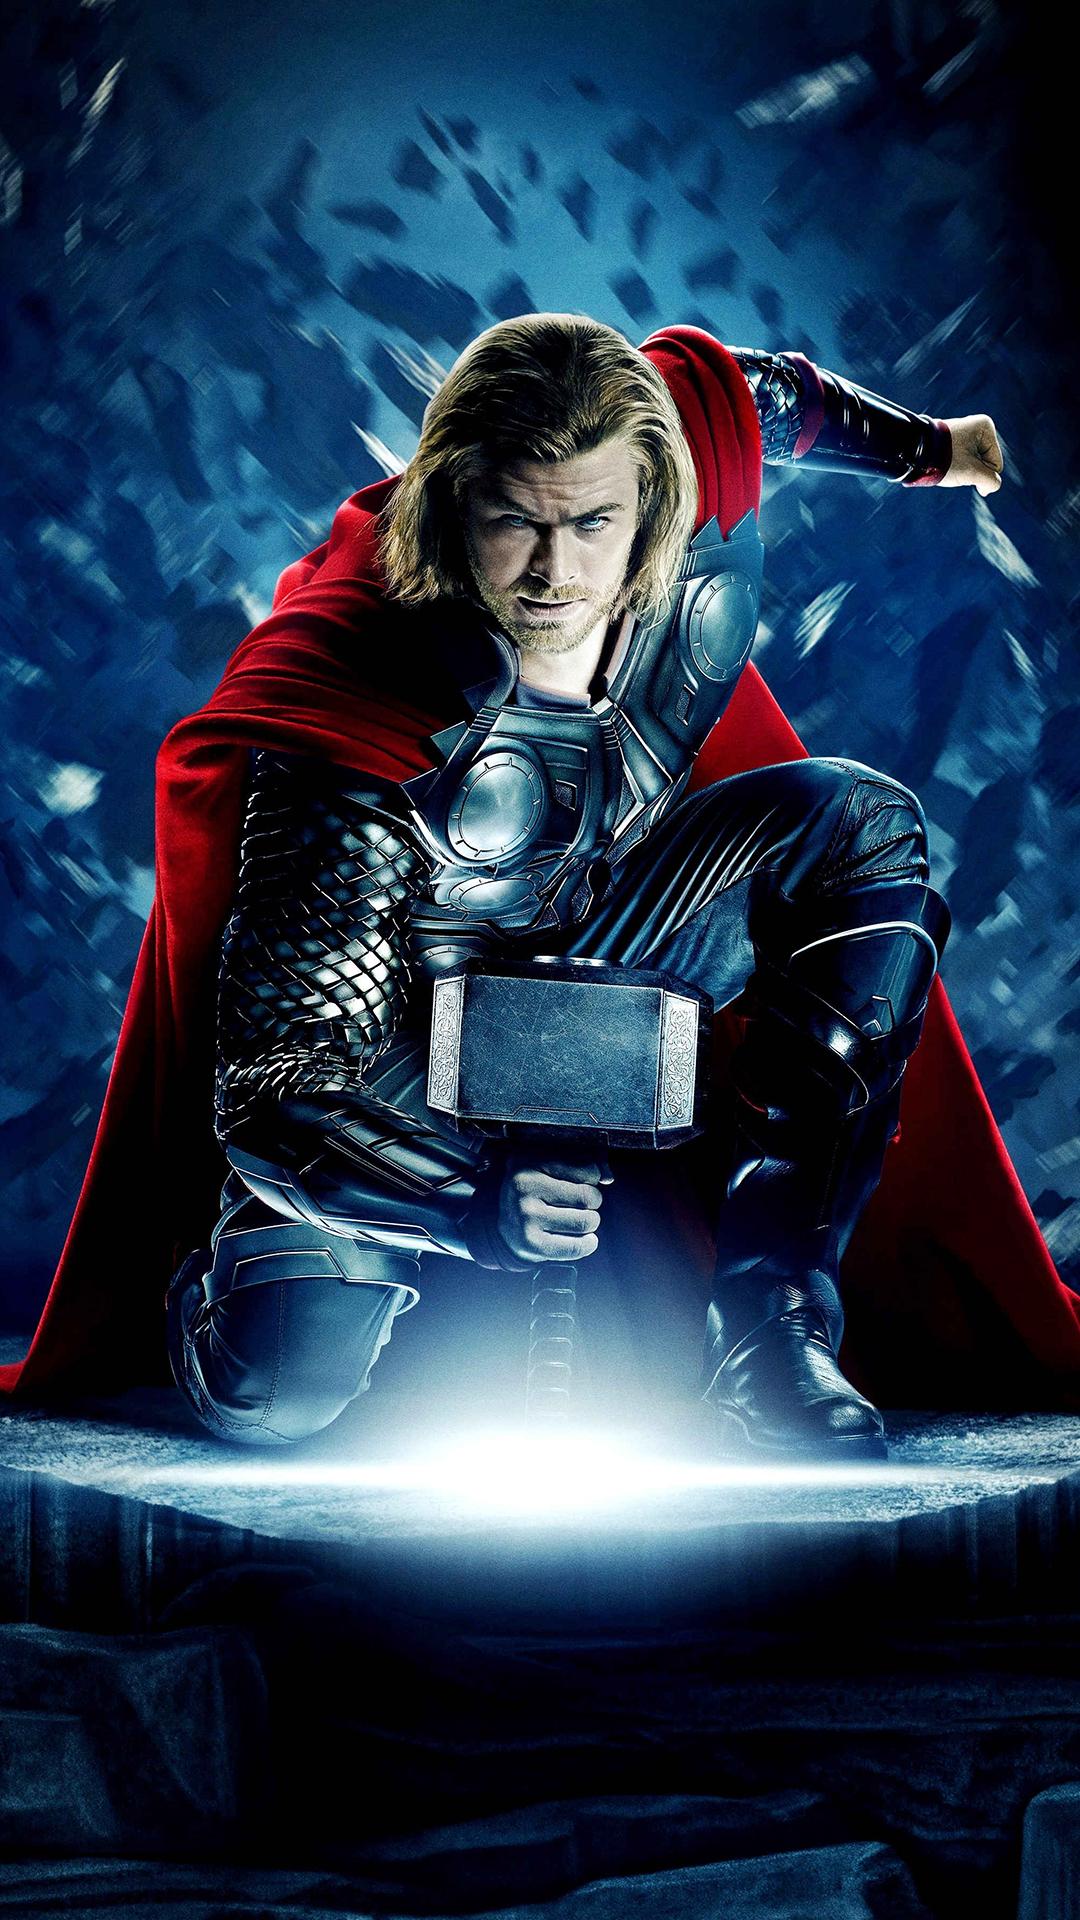 Thor The dark world htc one wallpaper